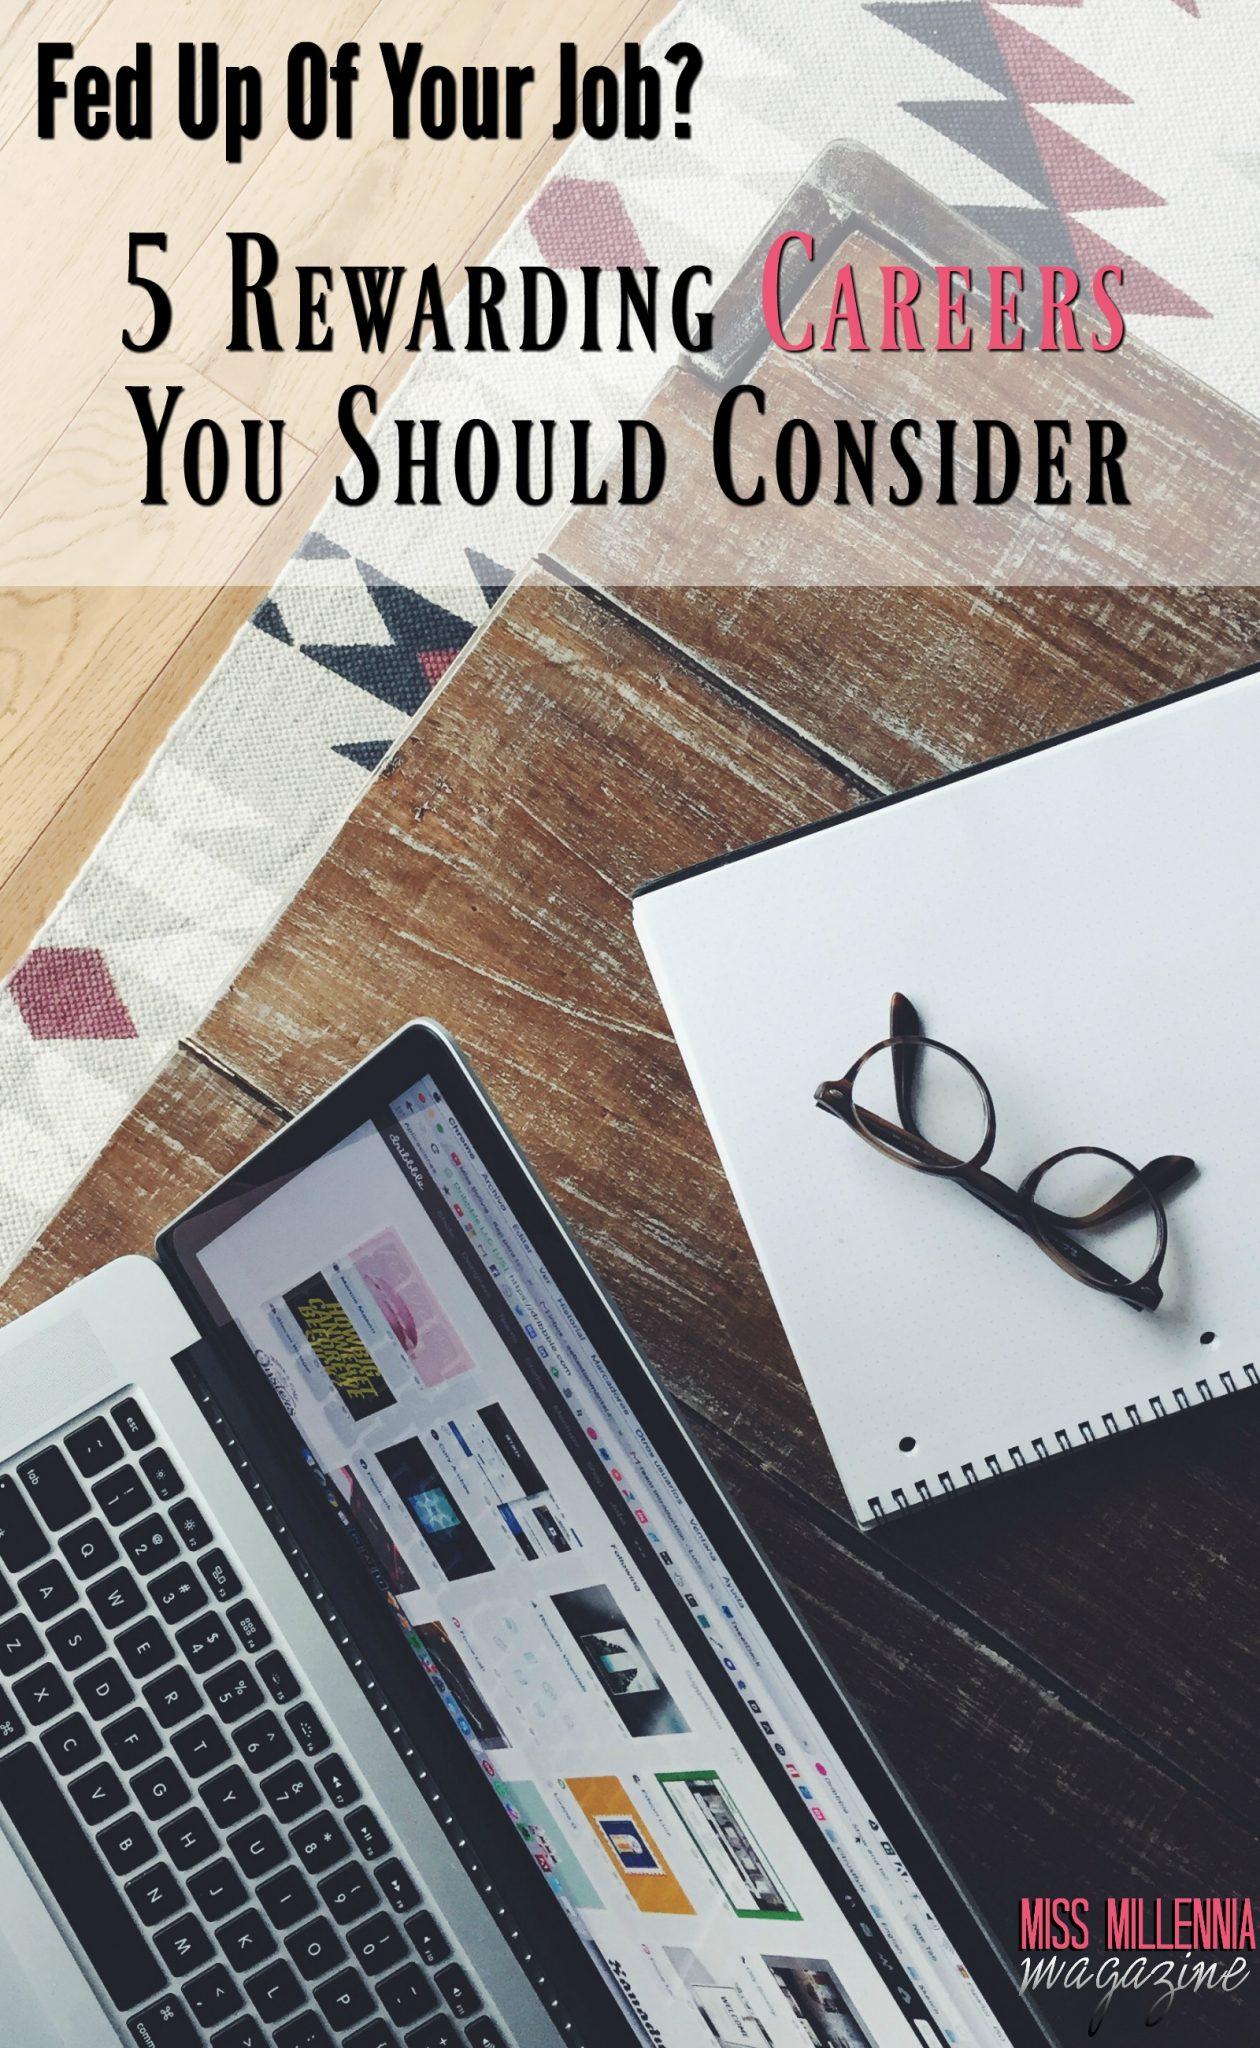 5 Rewarding Careers You Should Consider